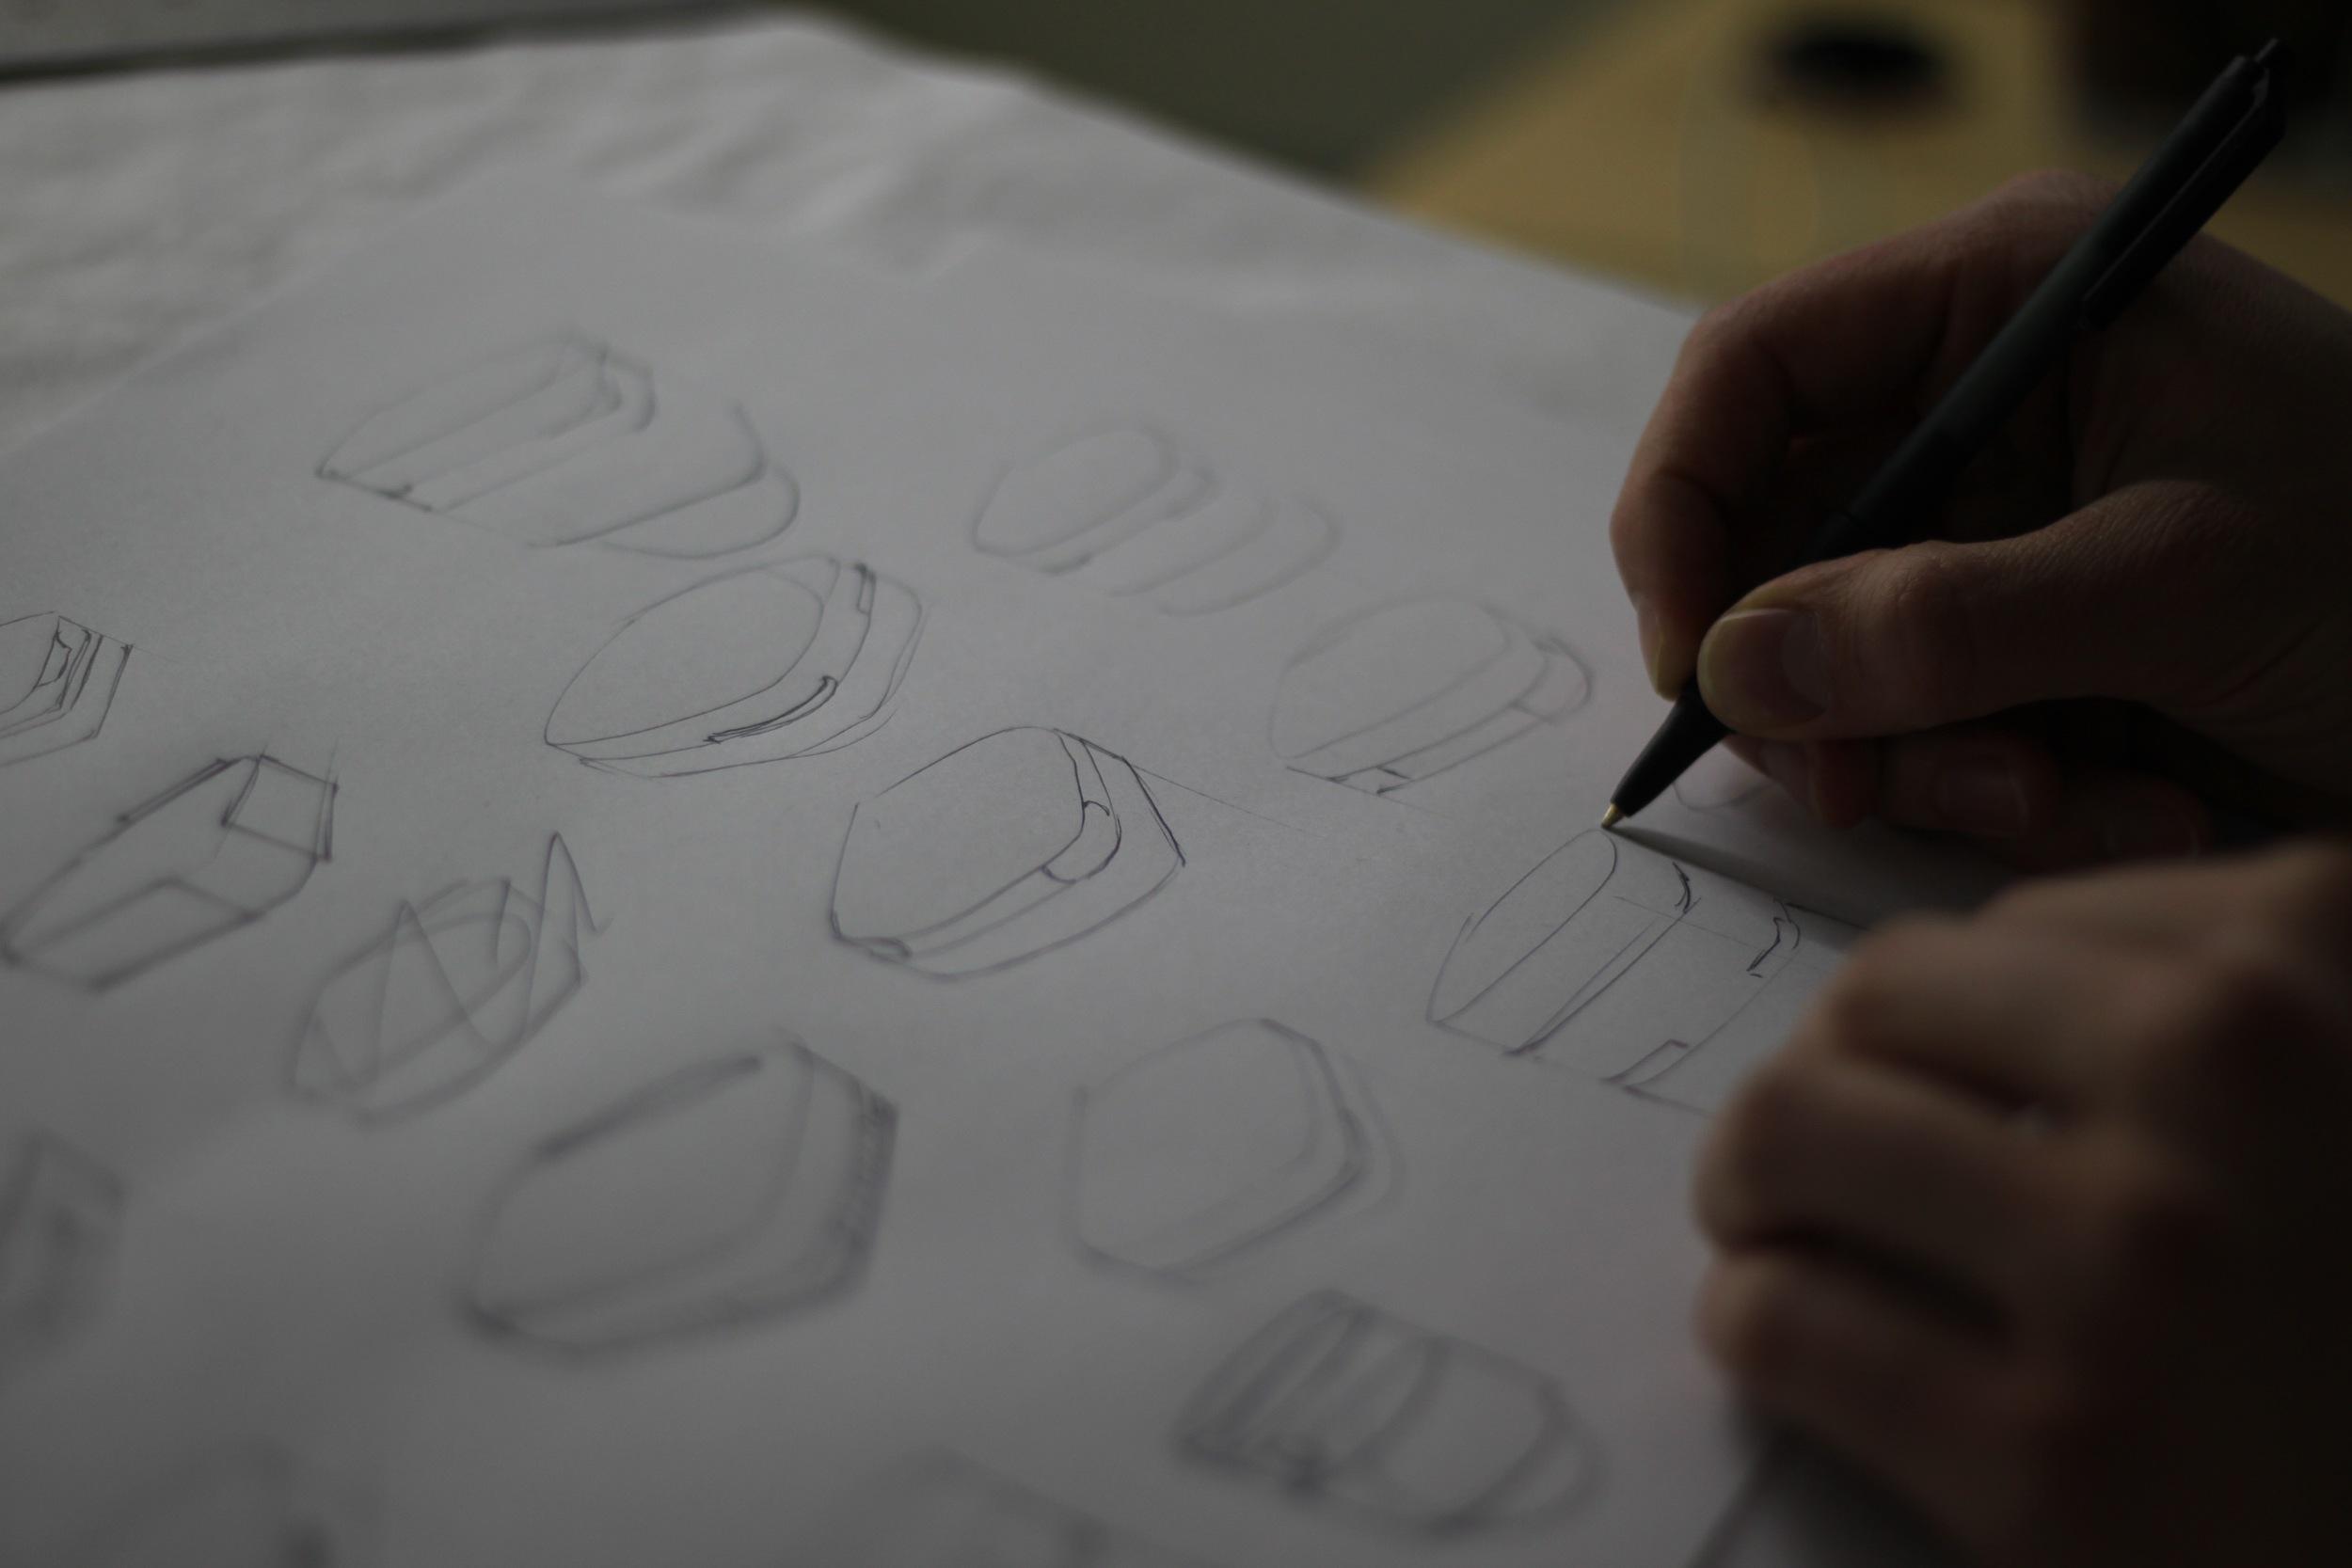 Sketching form development.